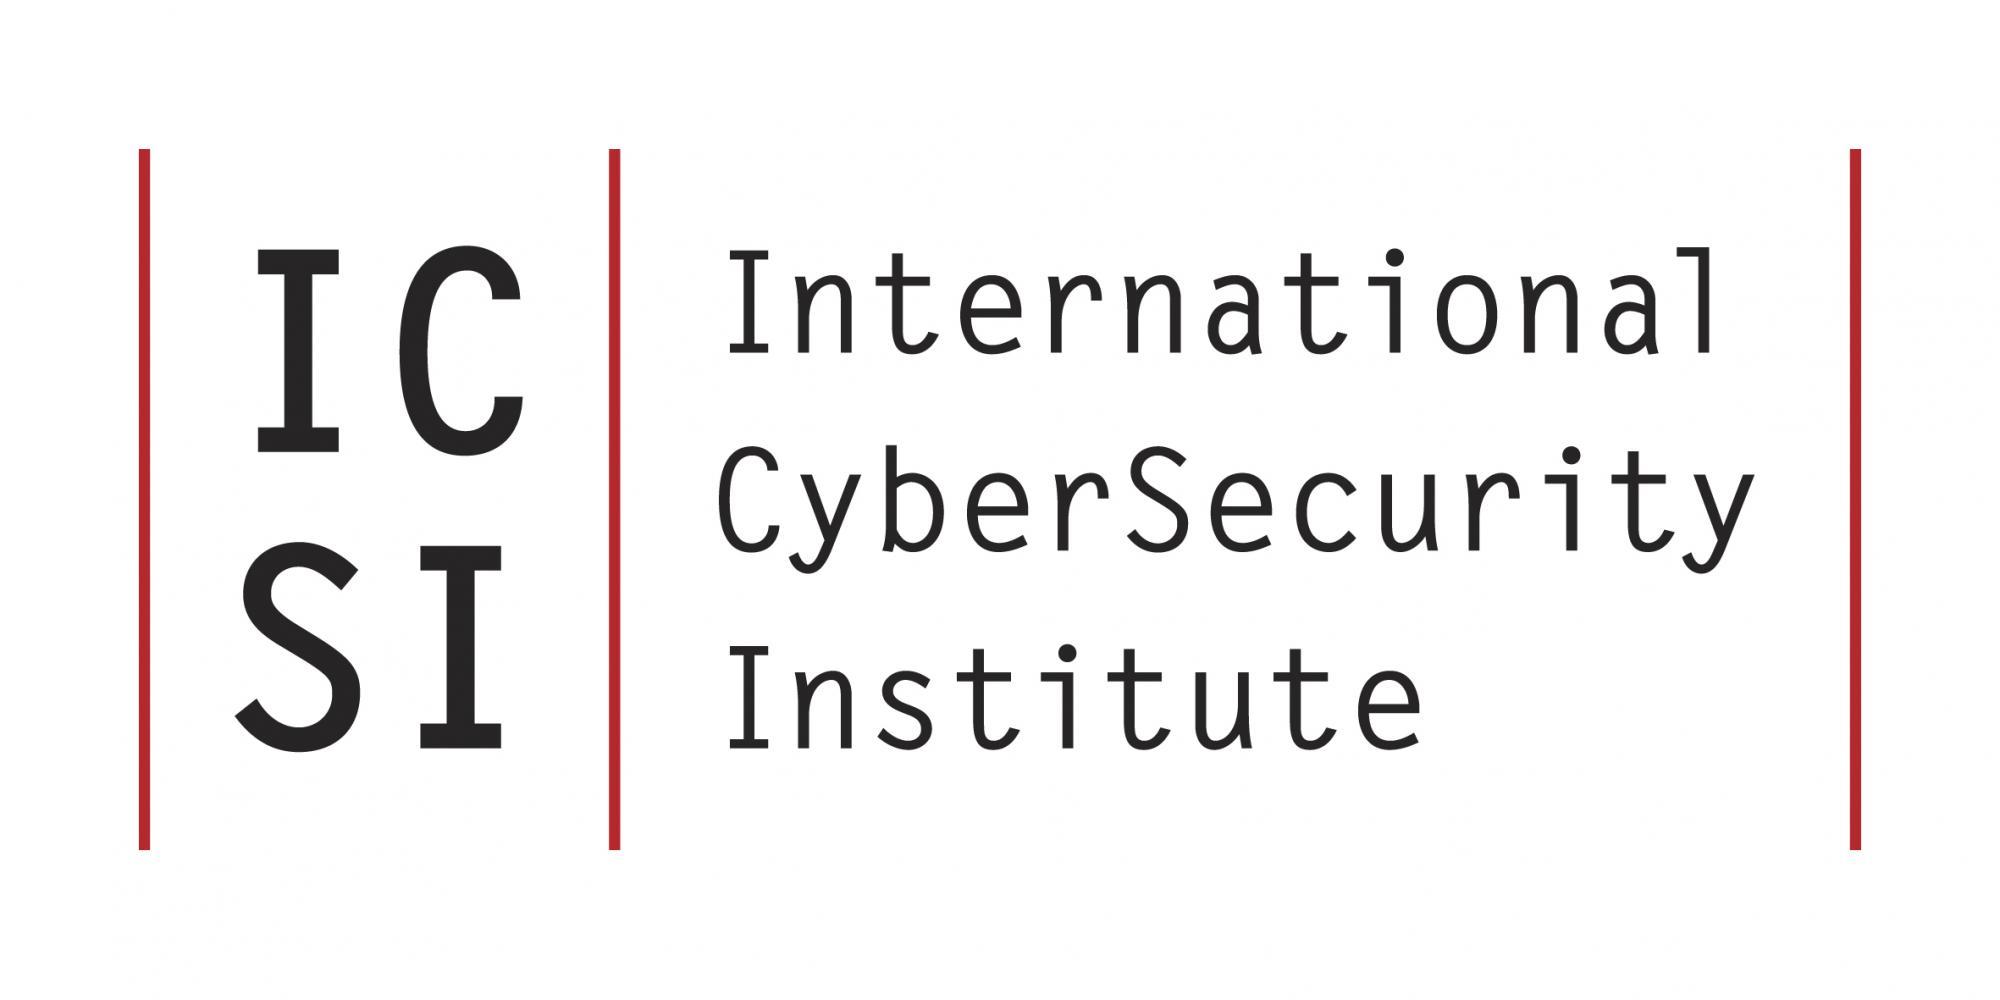 Обучение по CyberSecurity